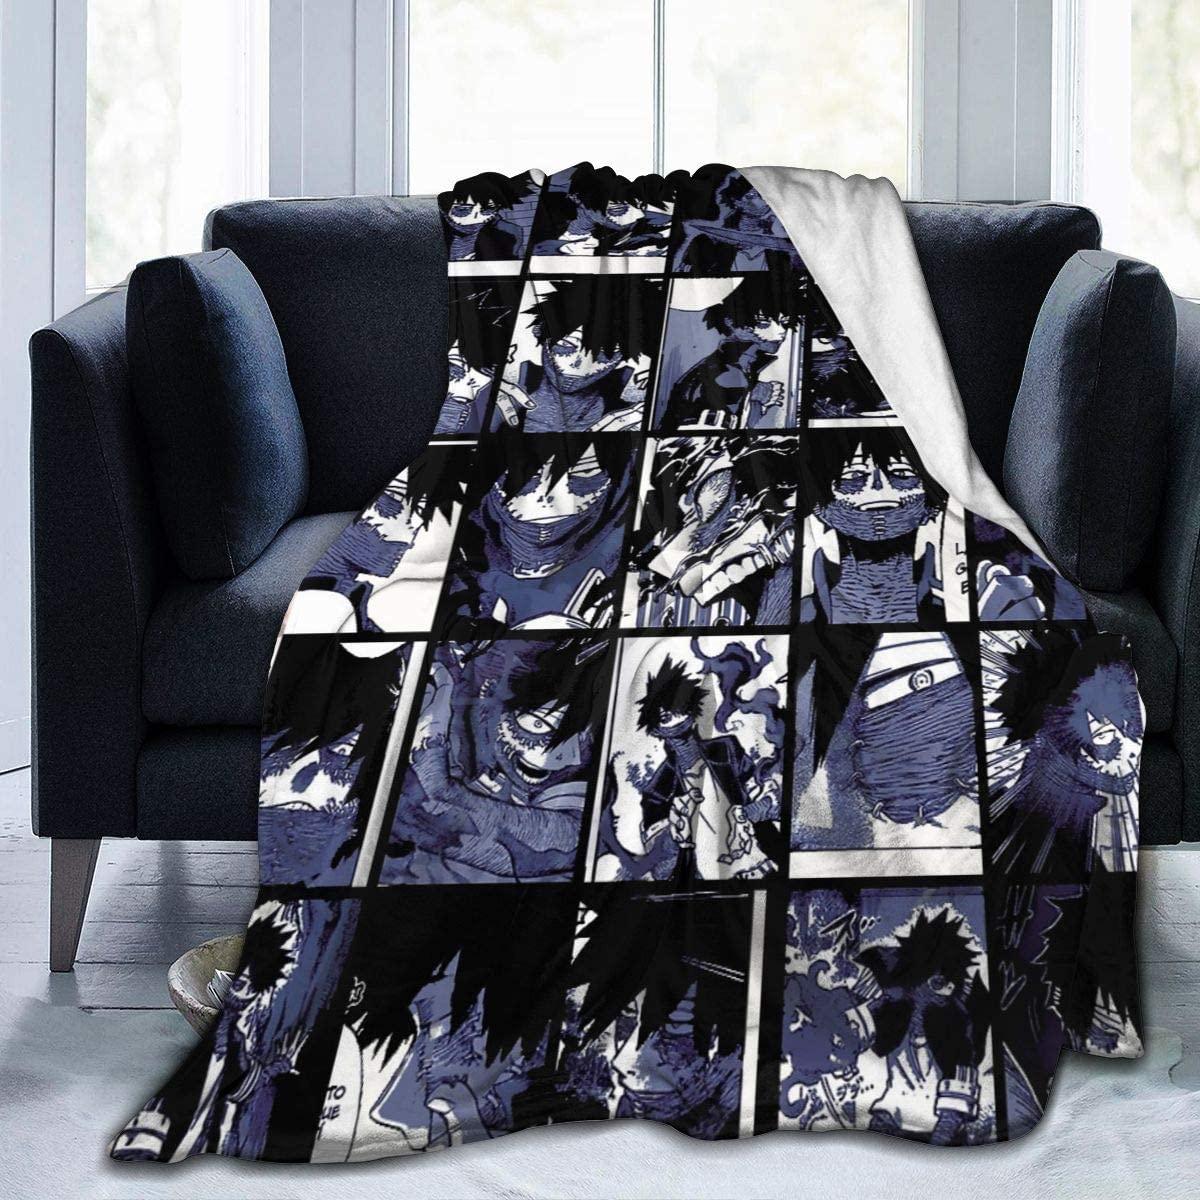 Meet Gentle My Hero Academia Dabi Collage Flannel Fleece Throw Blanket Lightweight Cozy Plush Microfiber Bedspreads Novelty Bedding Sofa Soft Air Conditioning Quilt S 50